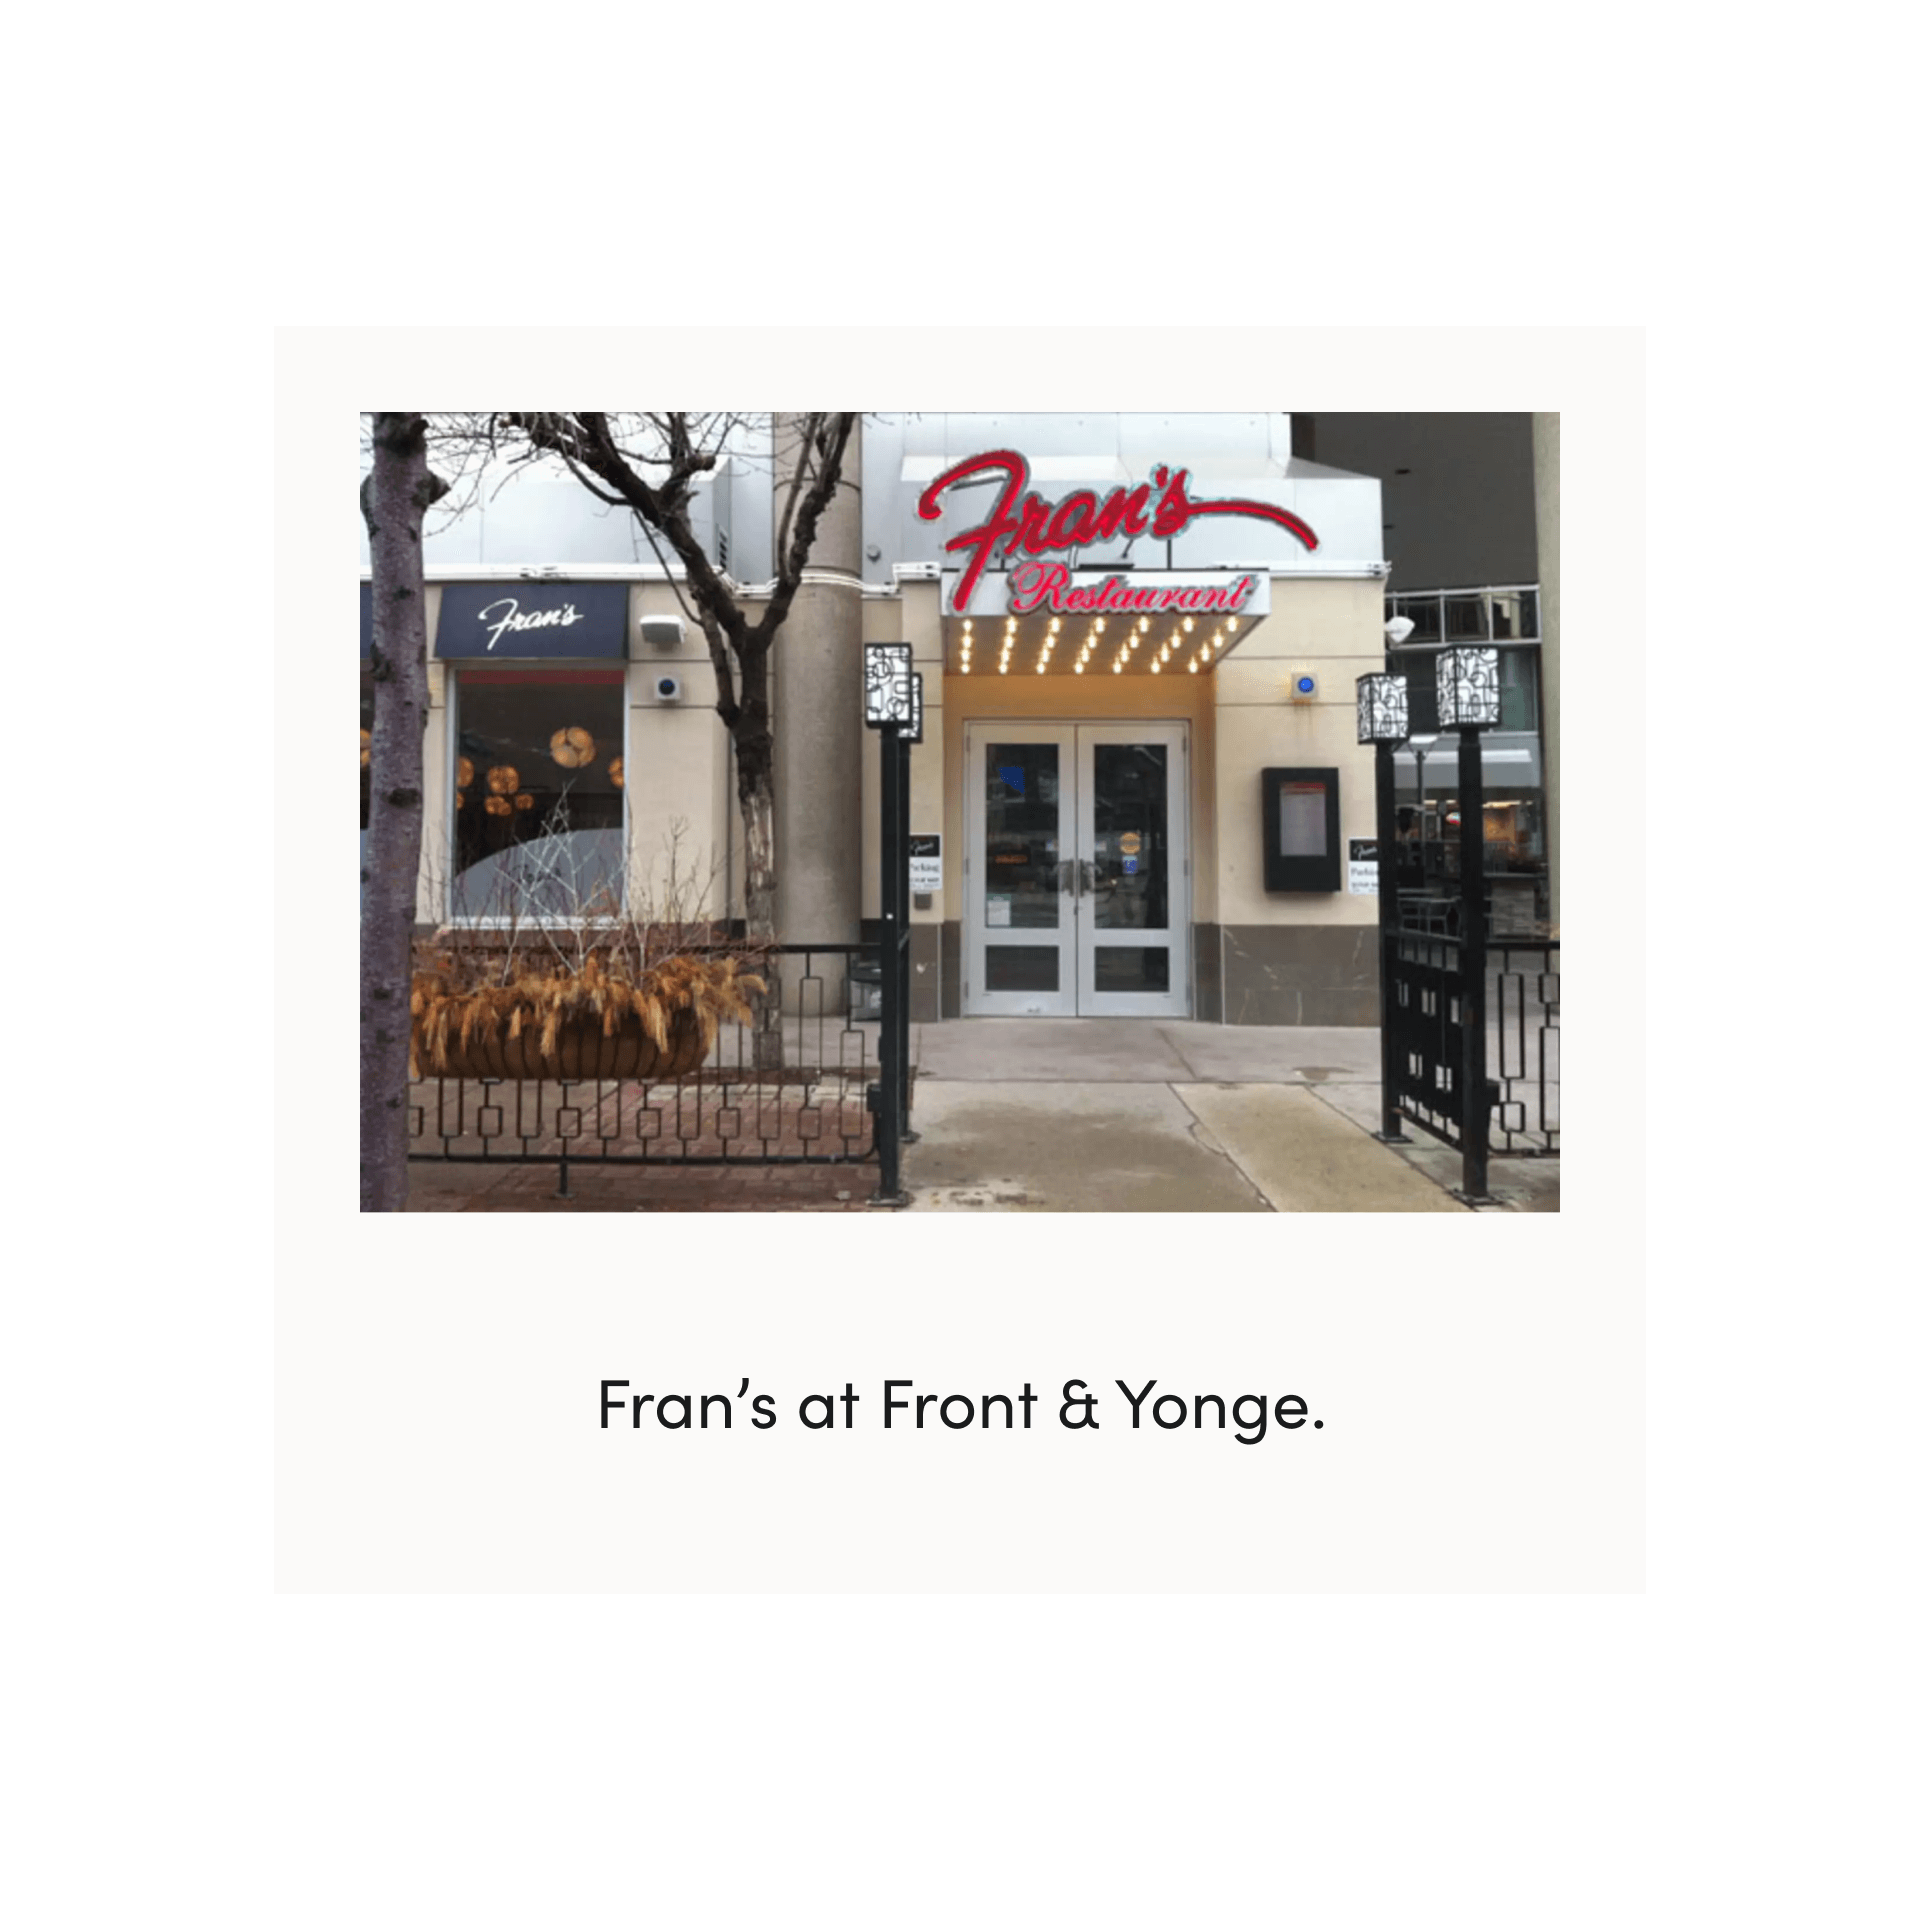 fran's restaurant on front street